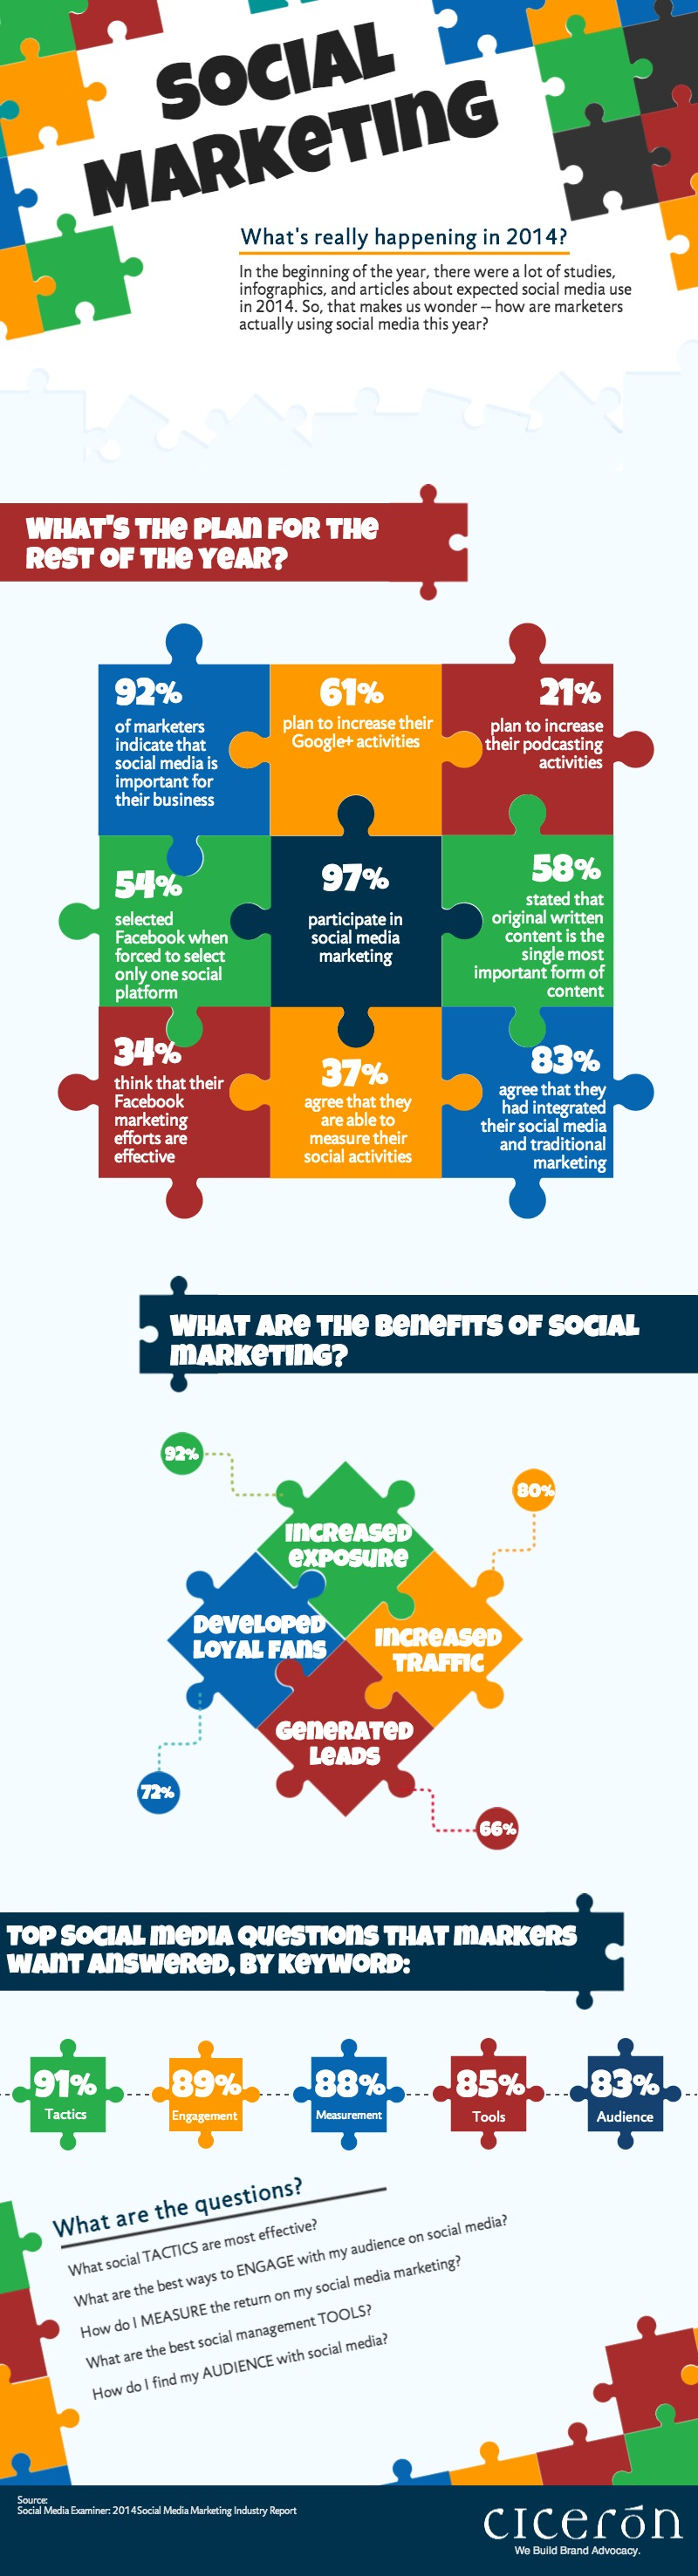 Social-Marketing-in-2014